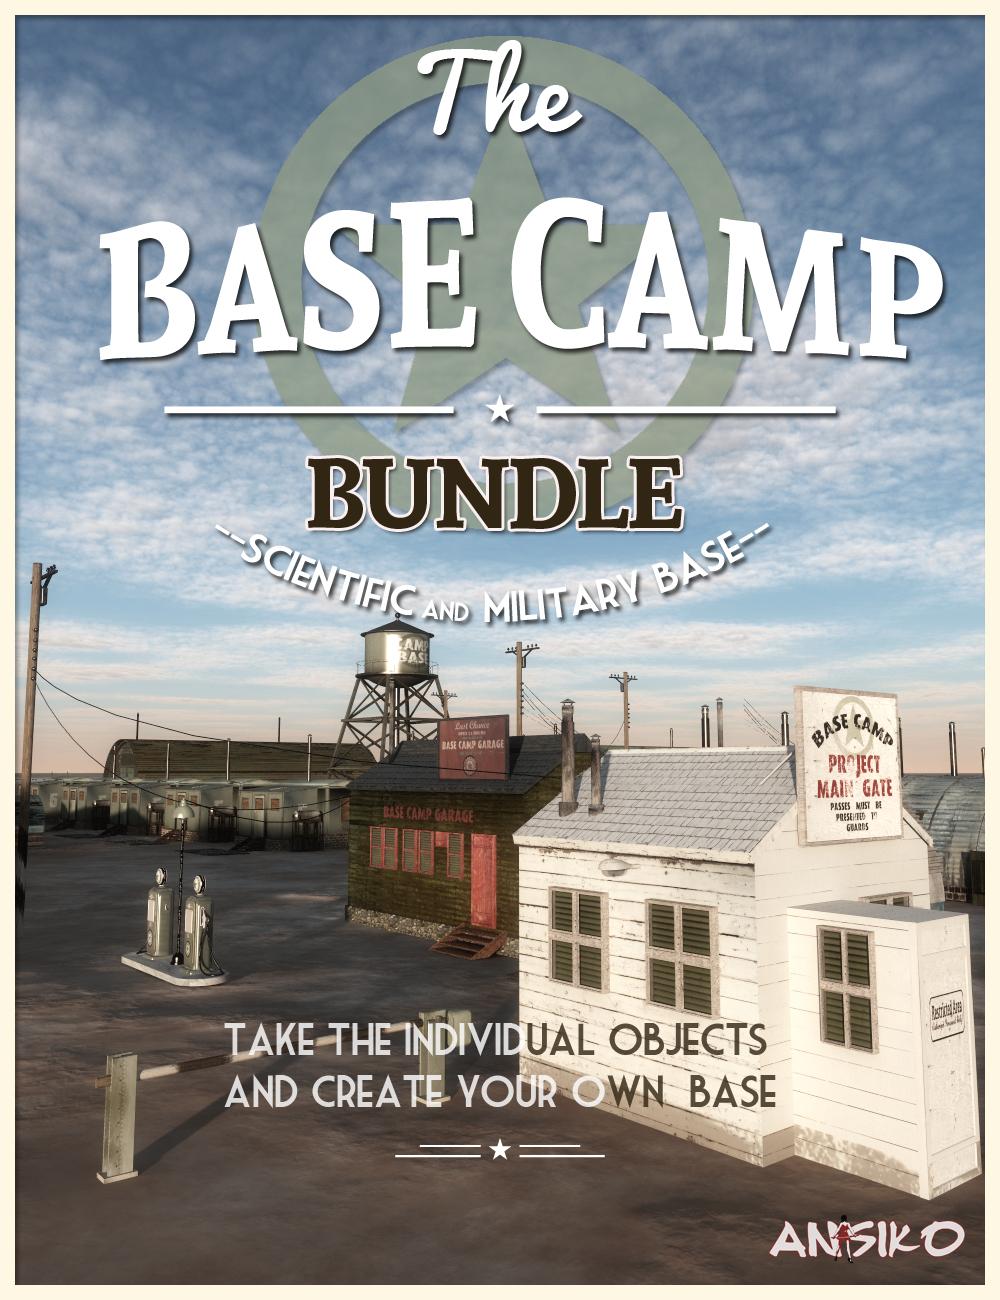 The Base Camp Bundle by: Ansiko, 3D Models by Daz 3D